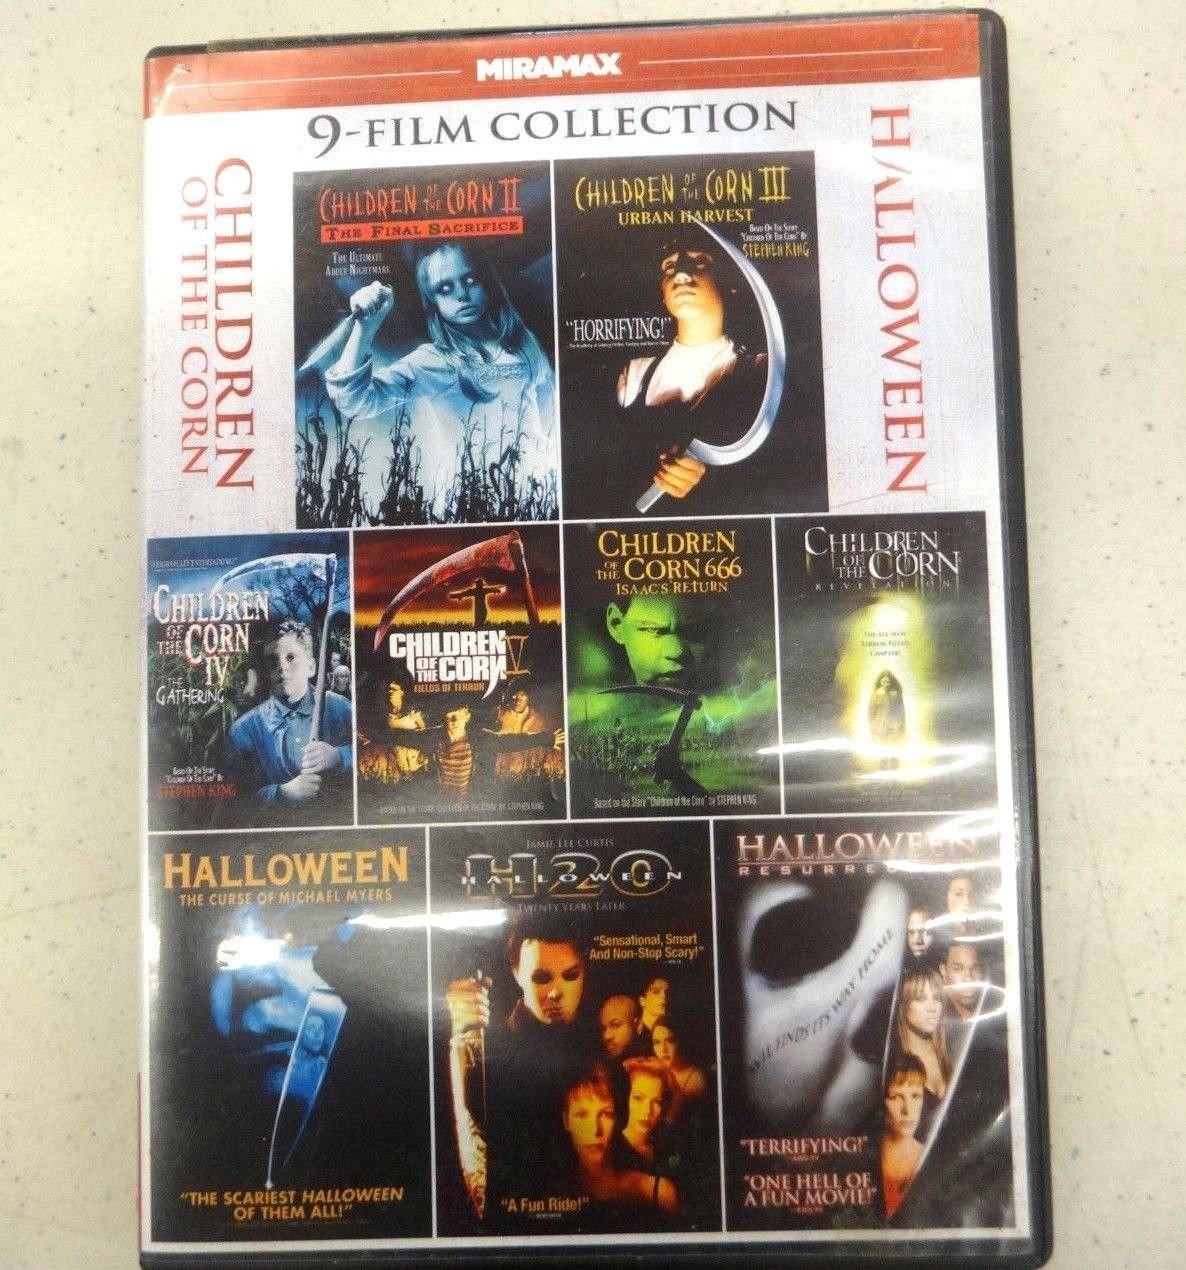 9movie 13hrs DVD Michael IRONSIDE,HALLOWEEN,Naomi WATTS,Karen BLACK,RESURRECTION